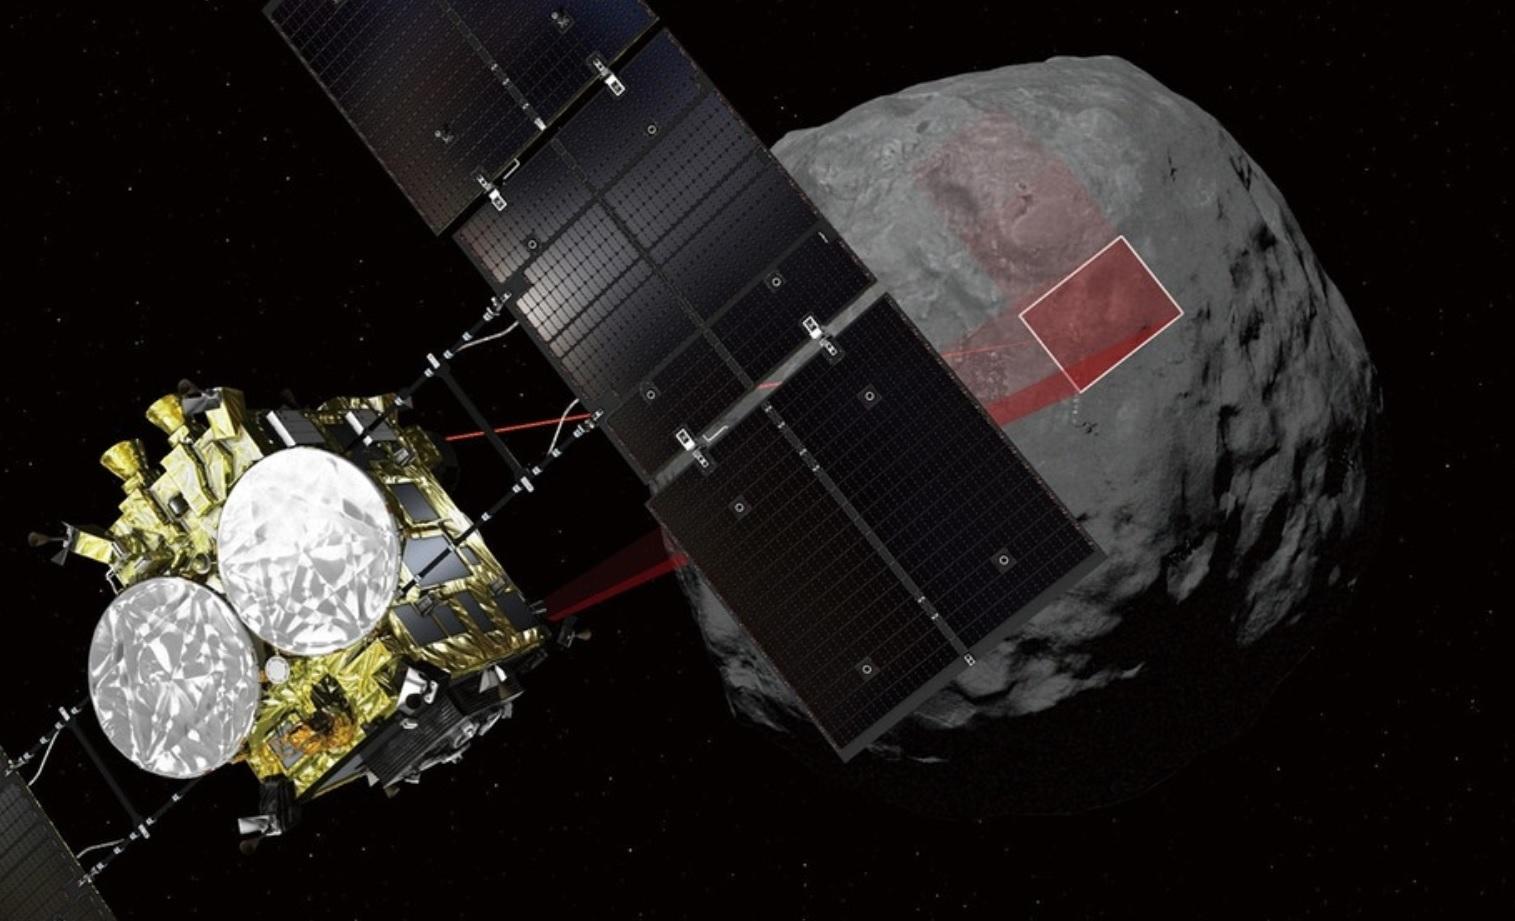 Mission Hayabusa 2 – Vorbereitung der MASCOT-Landung